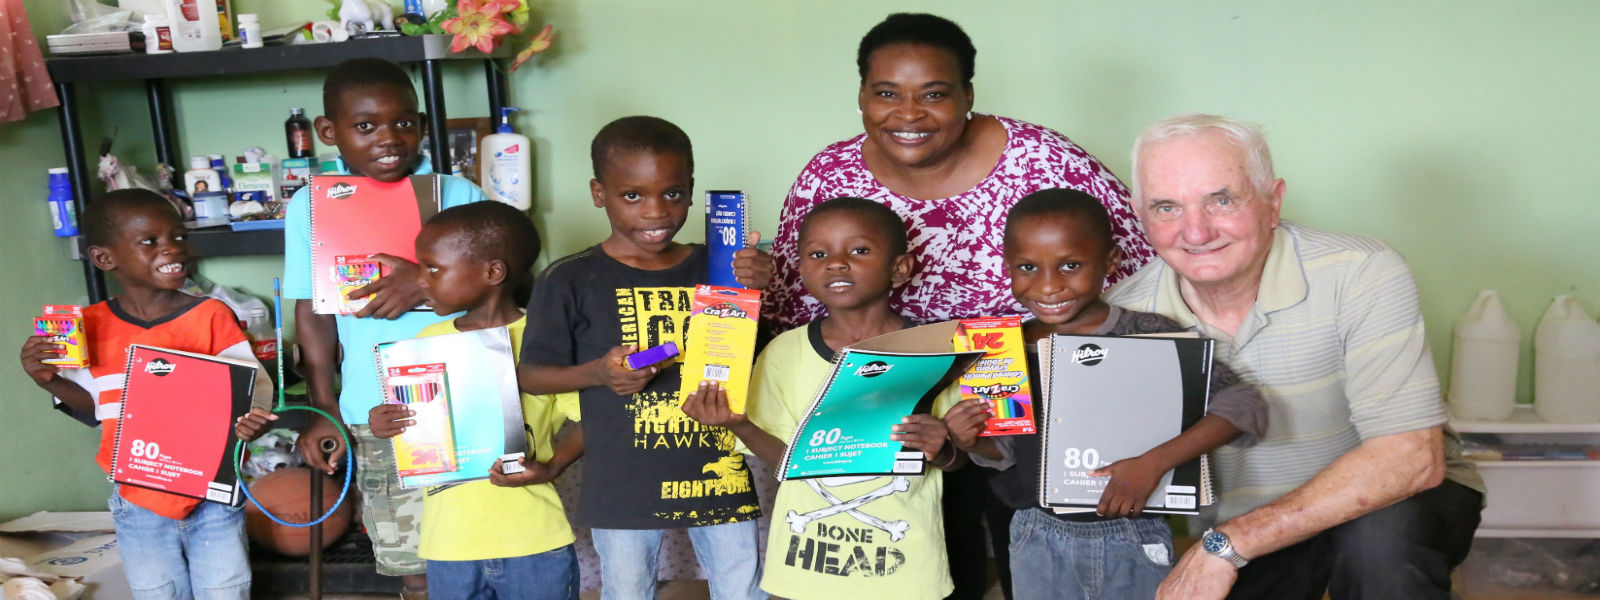 Photograph by Goldstream News Gazette of Divine Hands' children